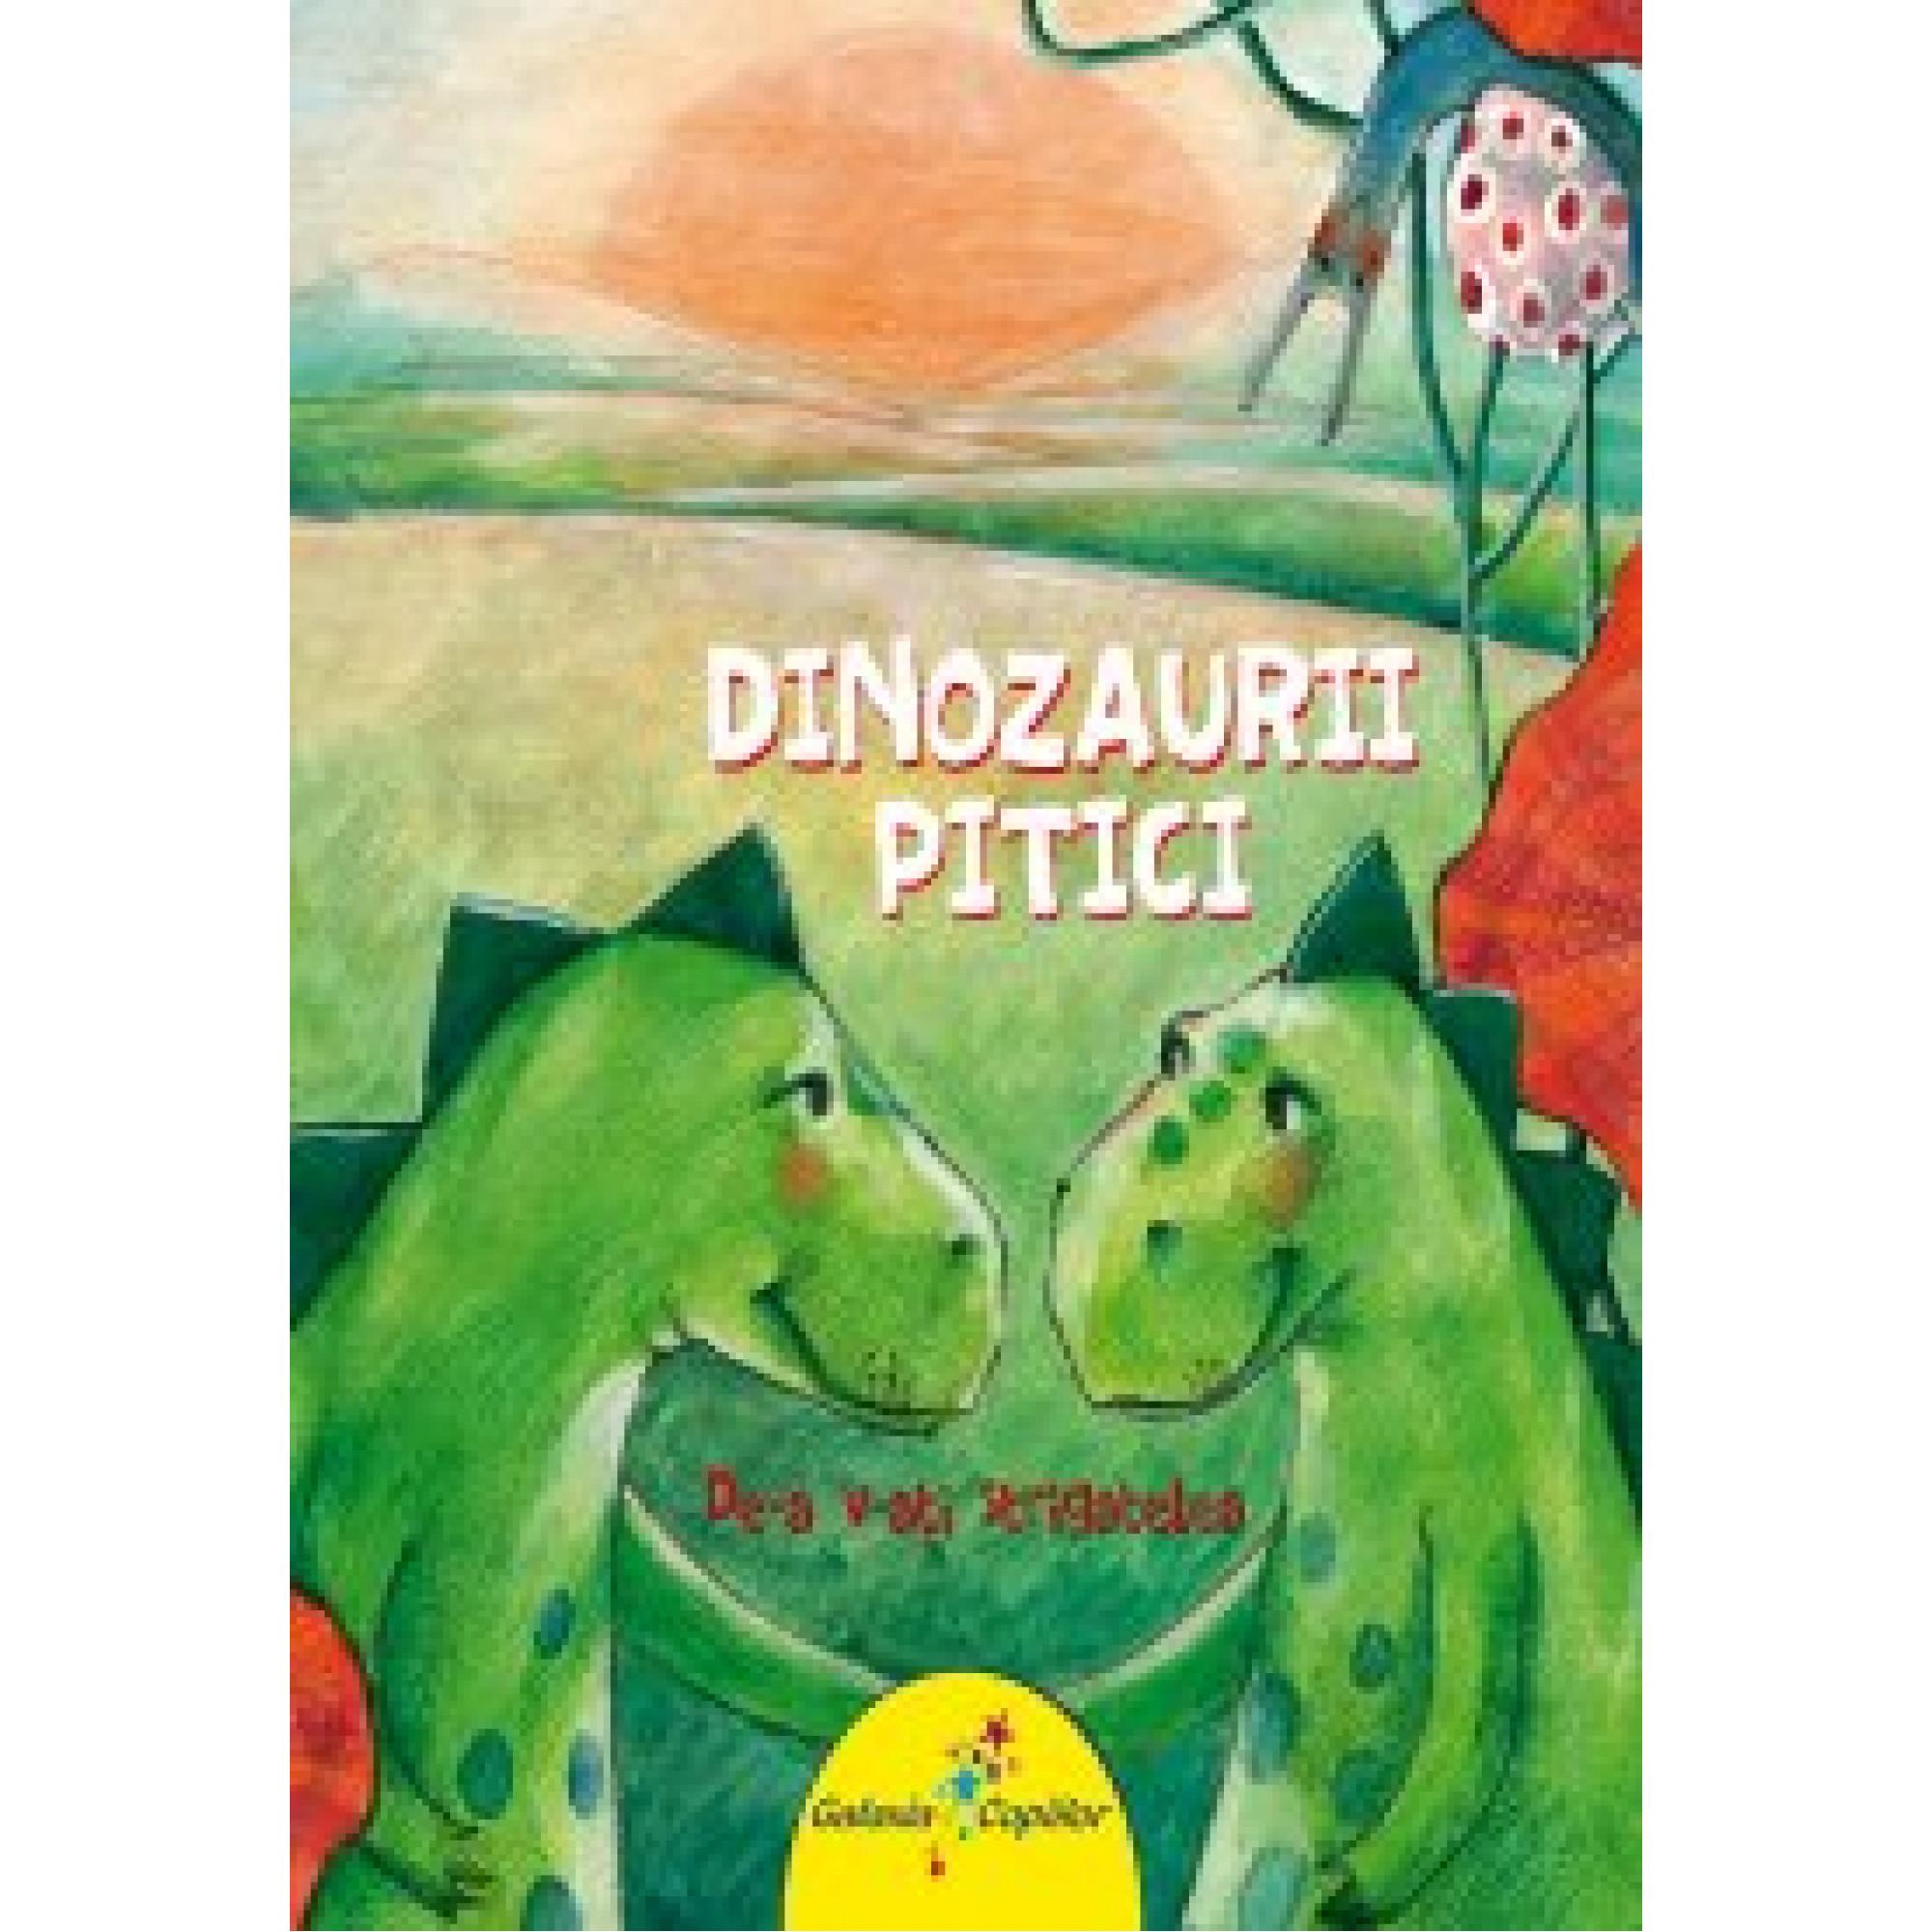 Dinozaurii pitici; Martin Zick